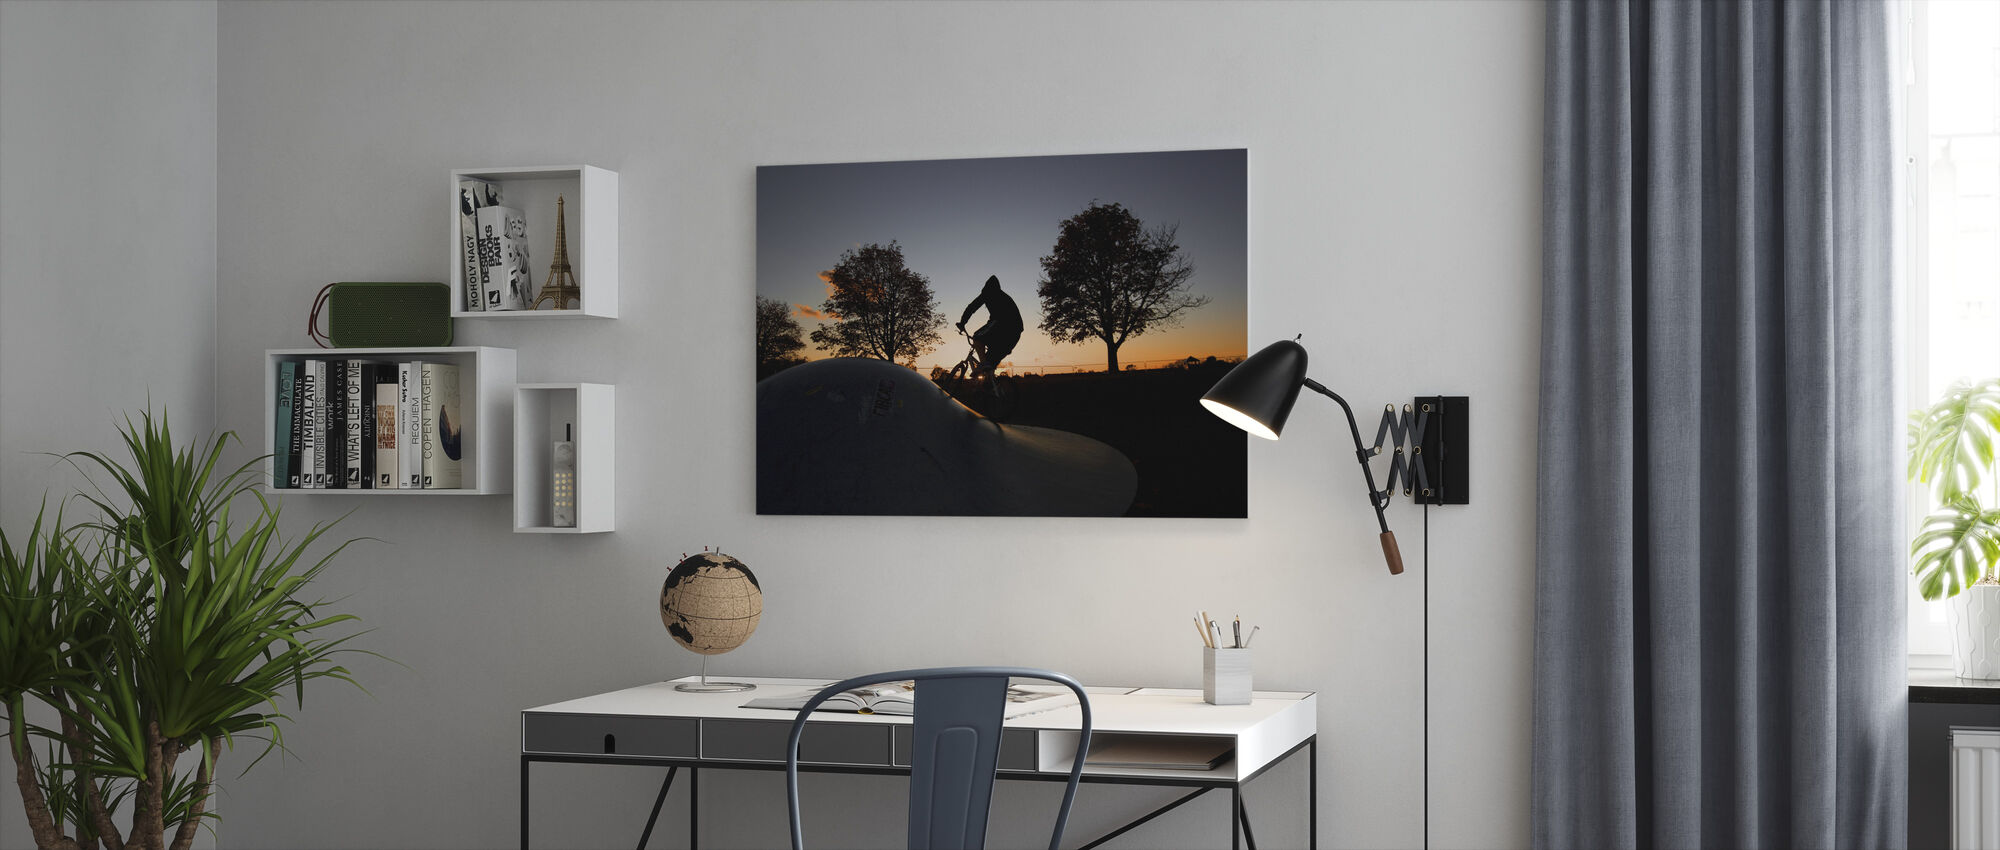 BMX Biking at Sunset - Canvas print - Office